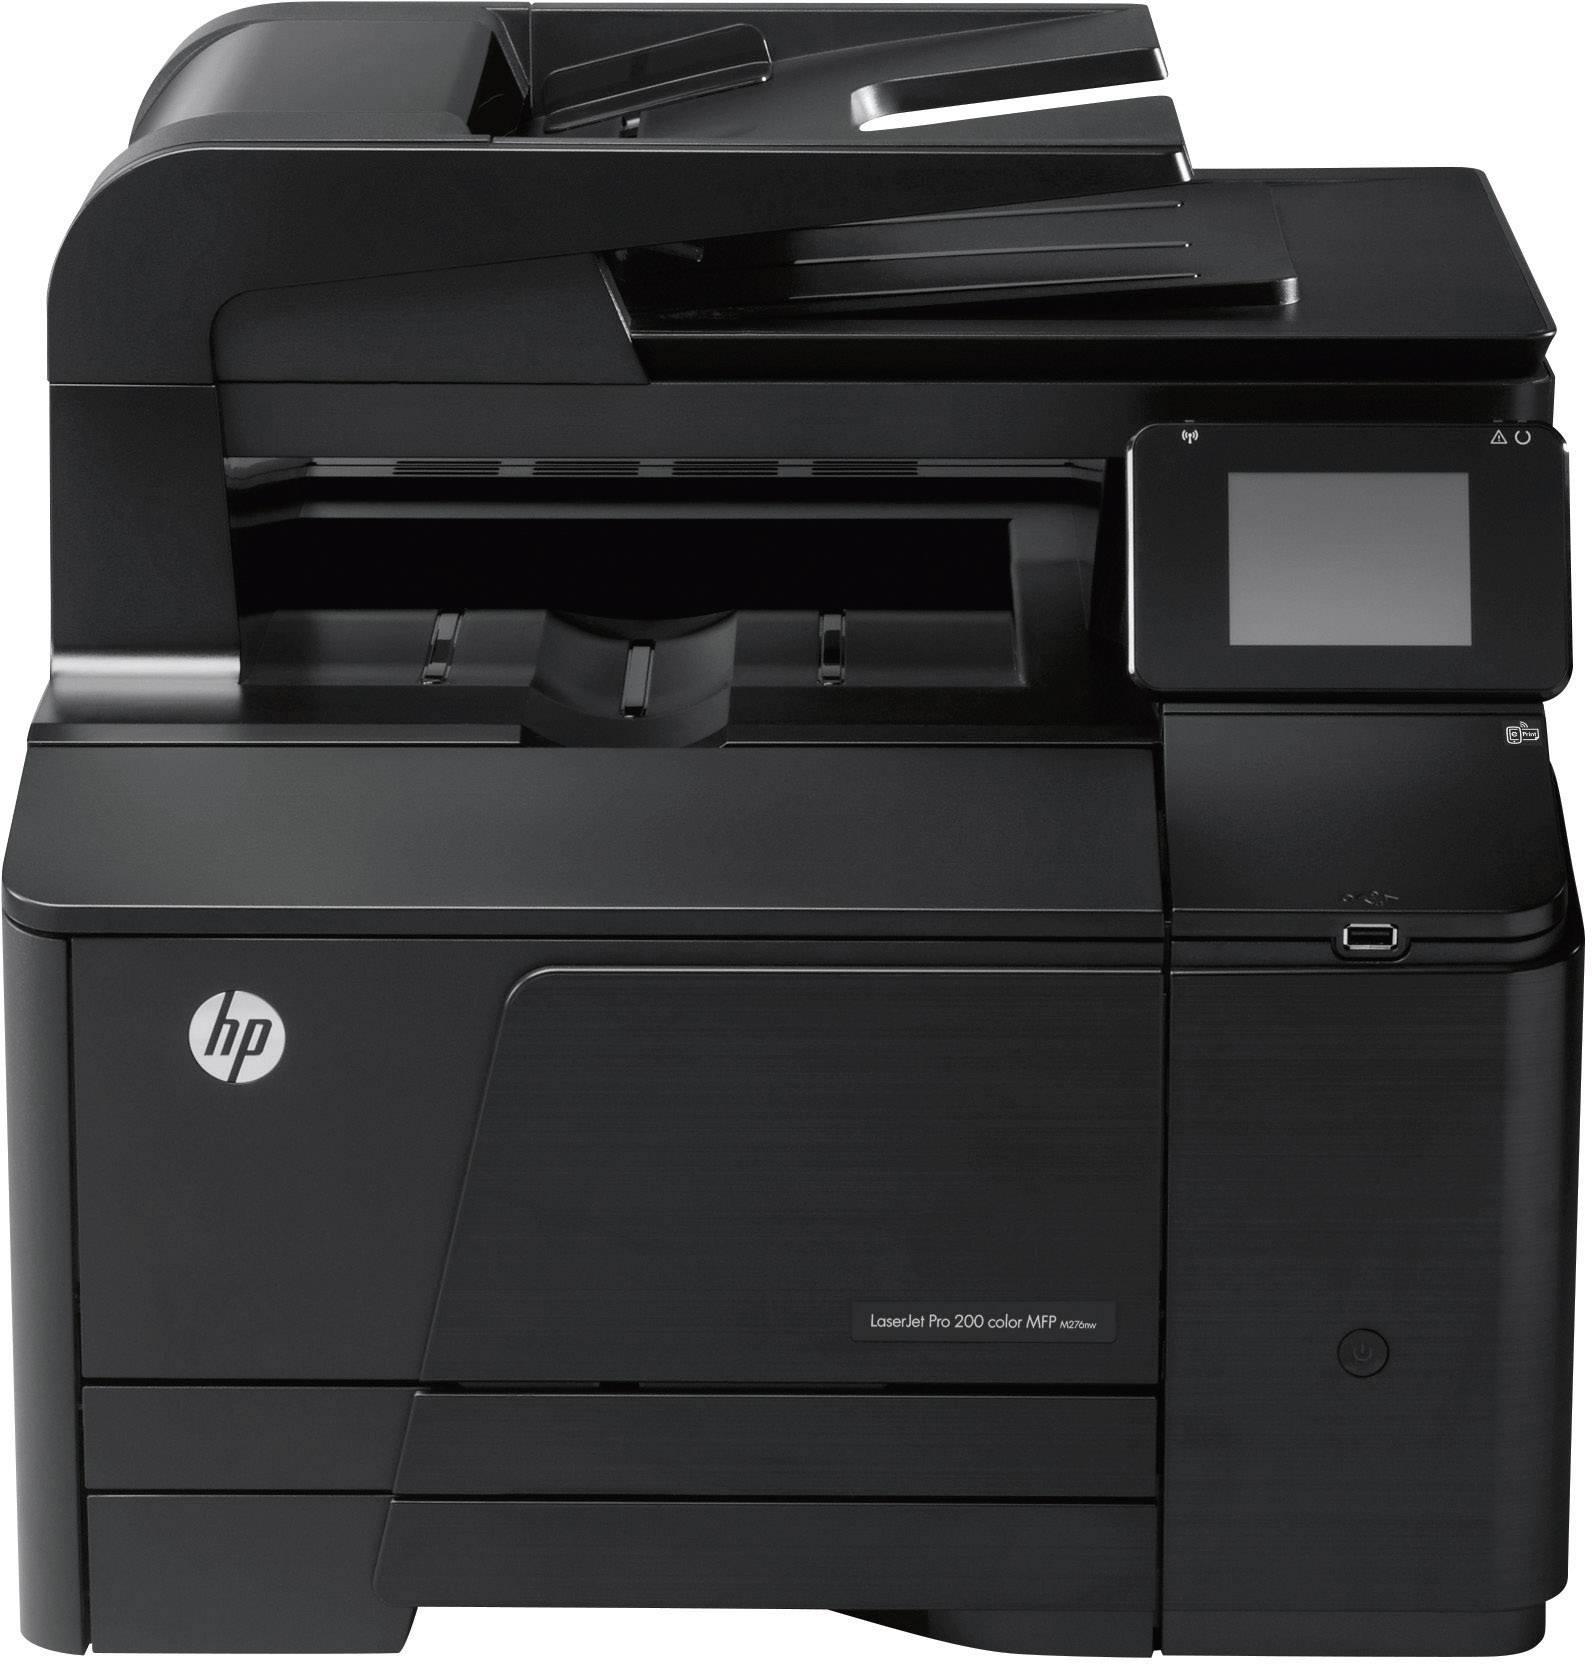 Hp Laserjet Pro 200 Color Mfp M276nw Multifunctionele Kleurenlaserprinter A4 Printen Scannen Kopiëren Faxen Lan Wifi